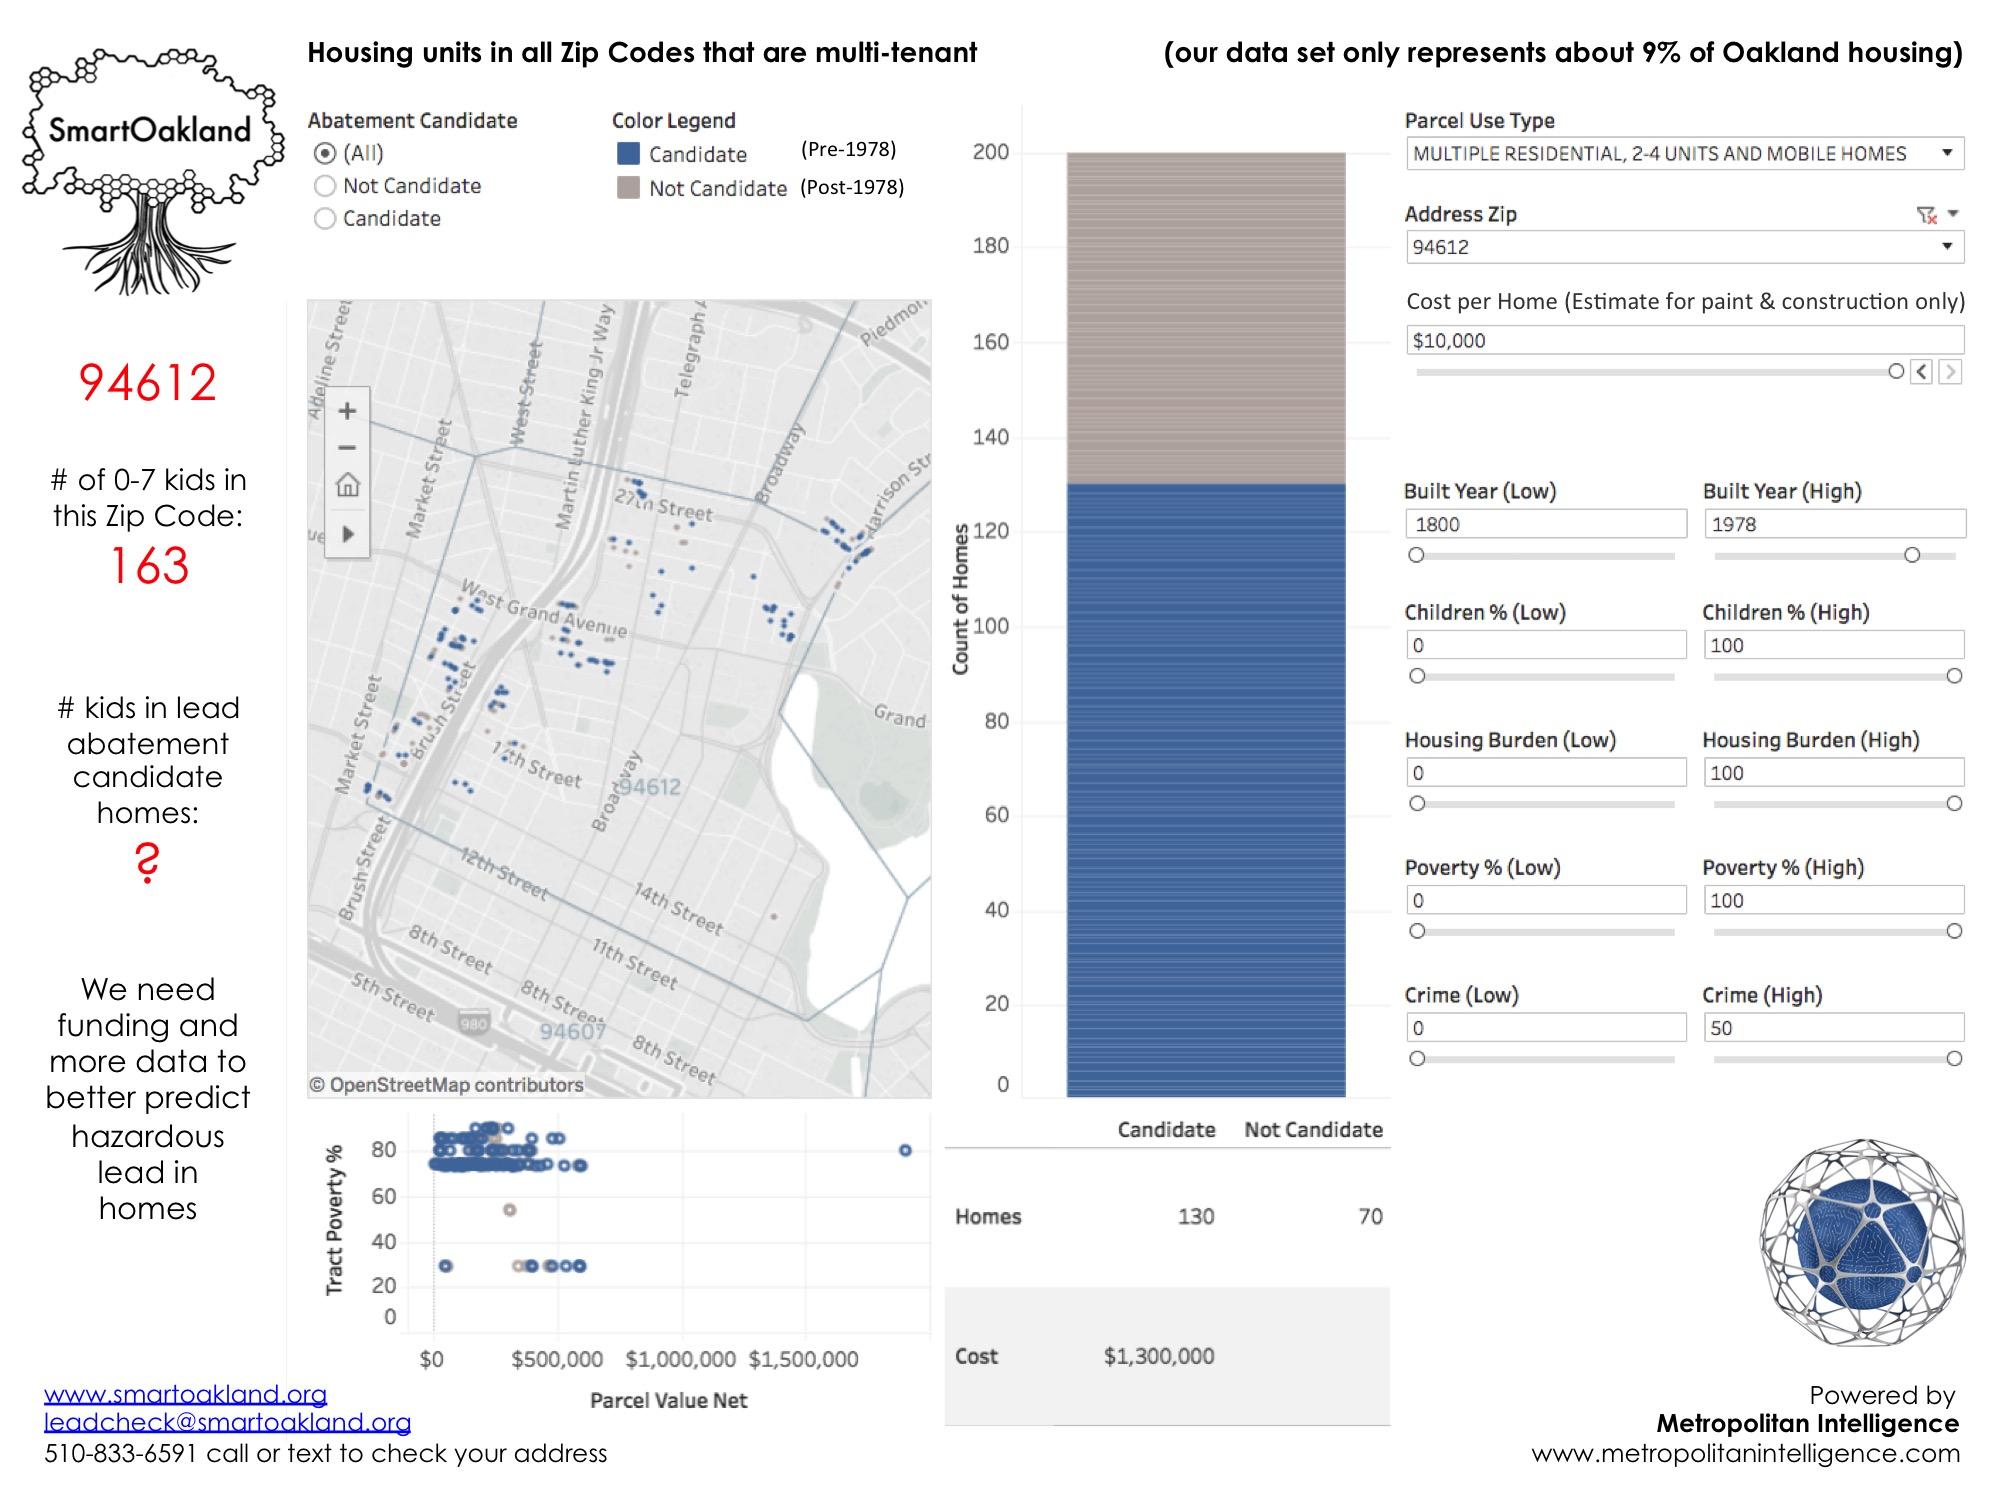 SmartOakland_Public Data Utility_Predictive Lead Detection_Oakland_Zip Code_94612_Promo Meetup.jpg